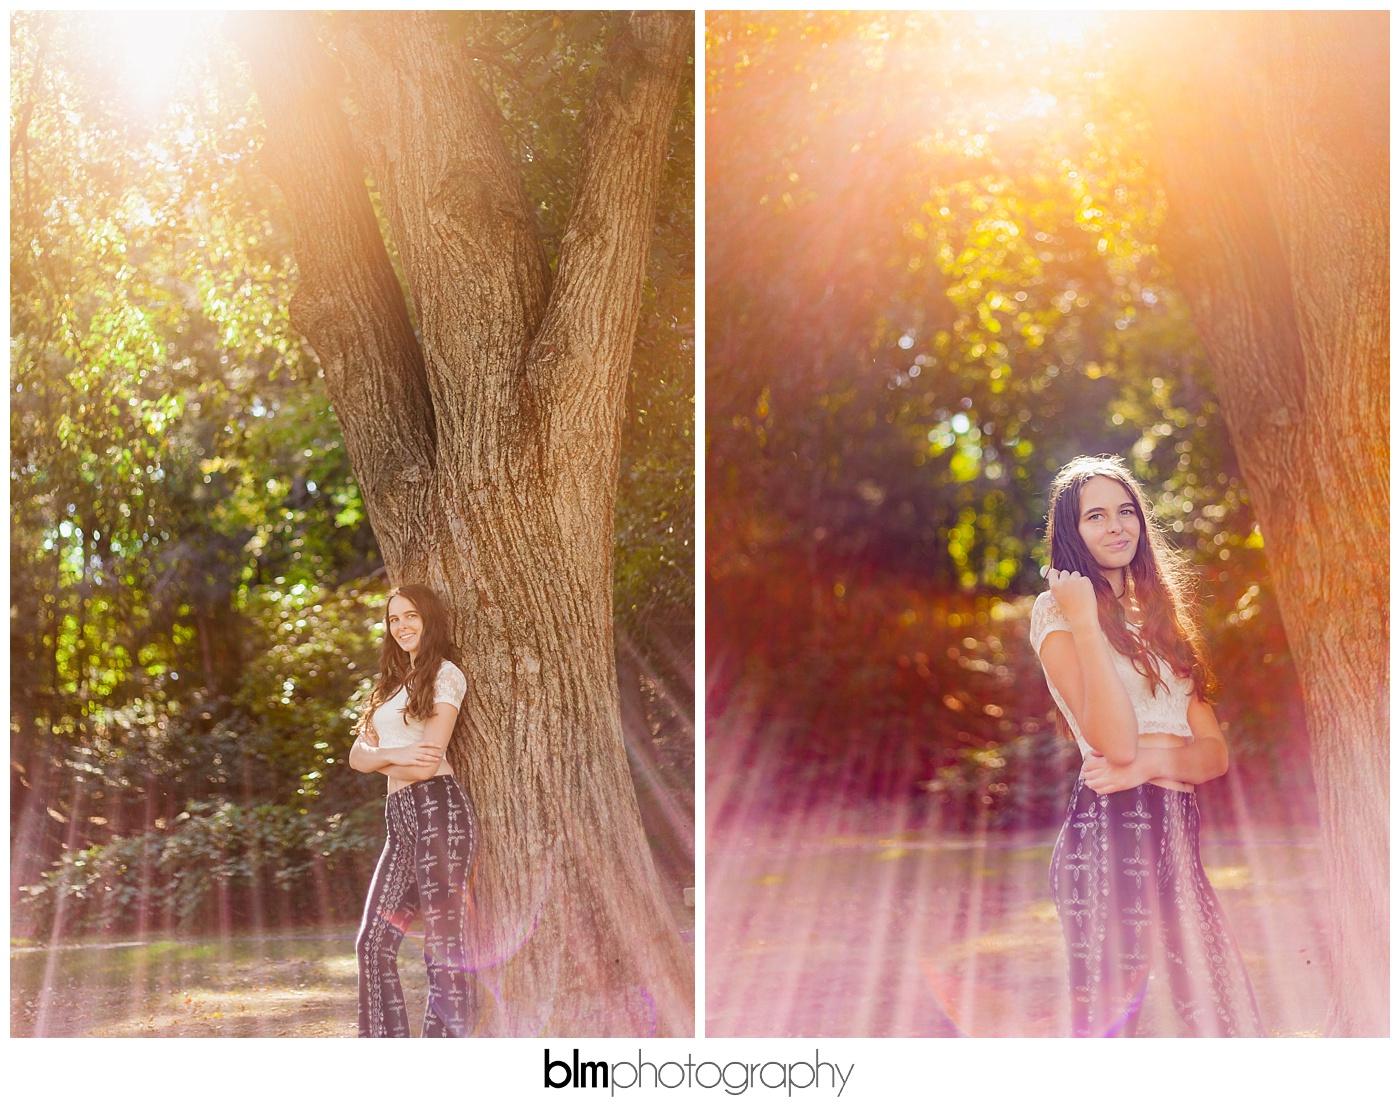 Carly-Cresta_Senior-Portraits_091516-0764.jpg